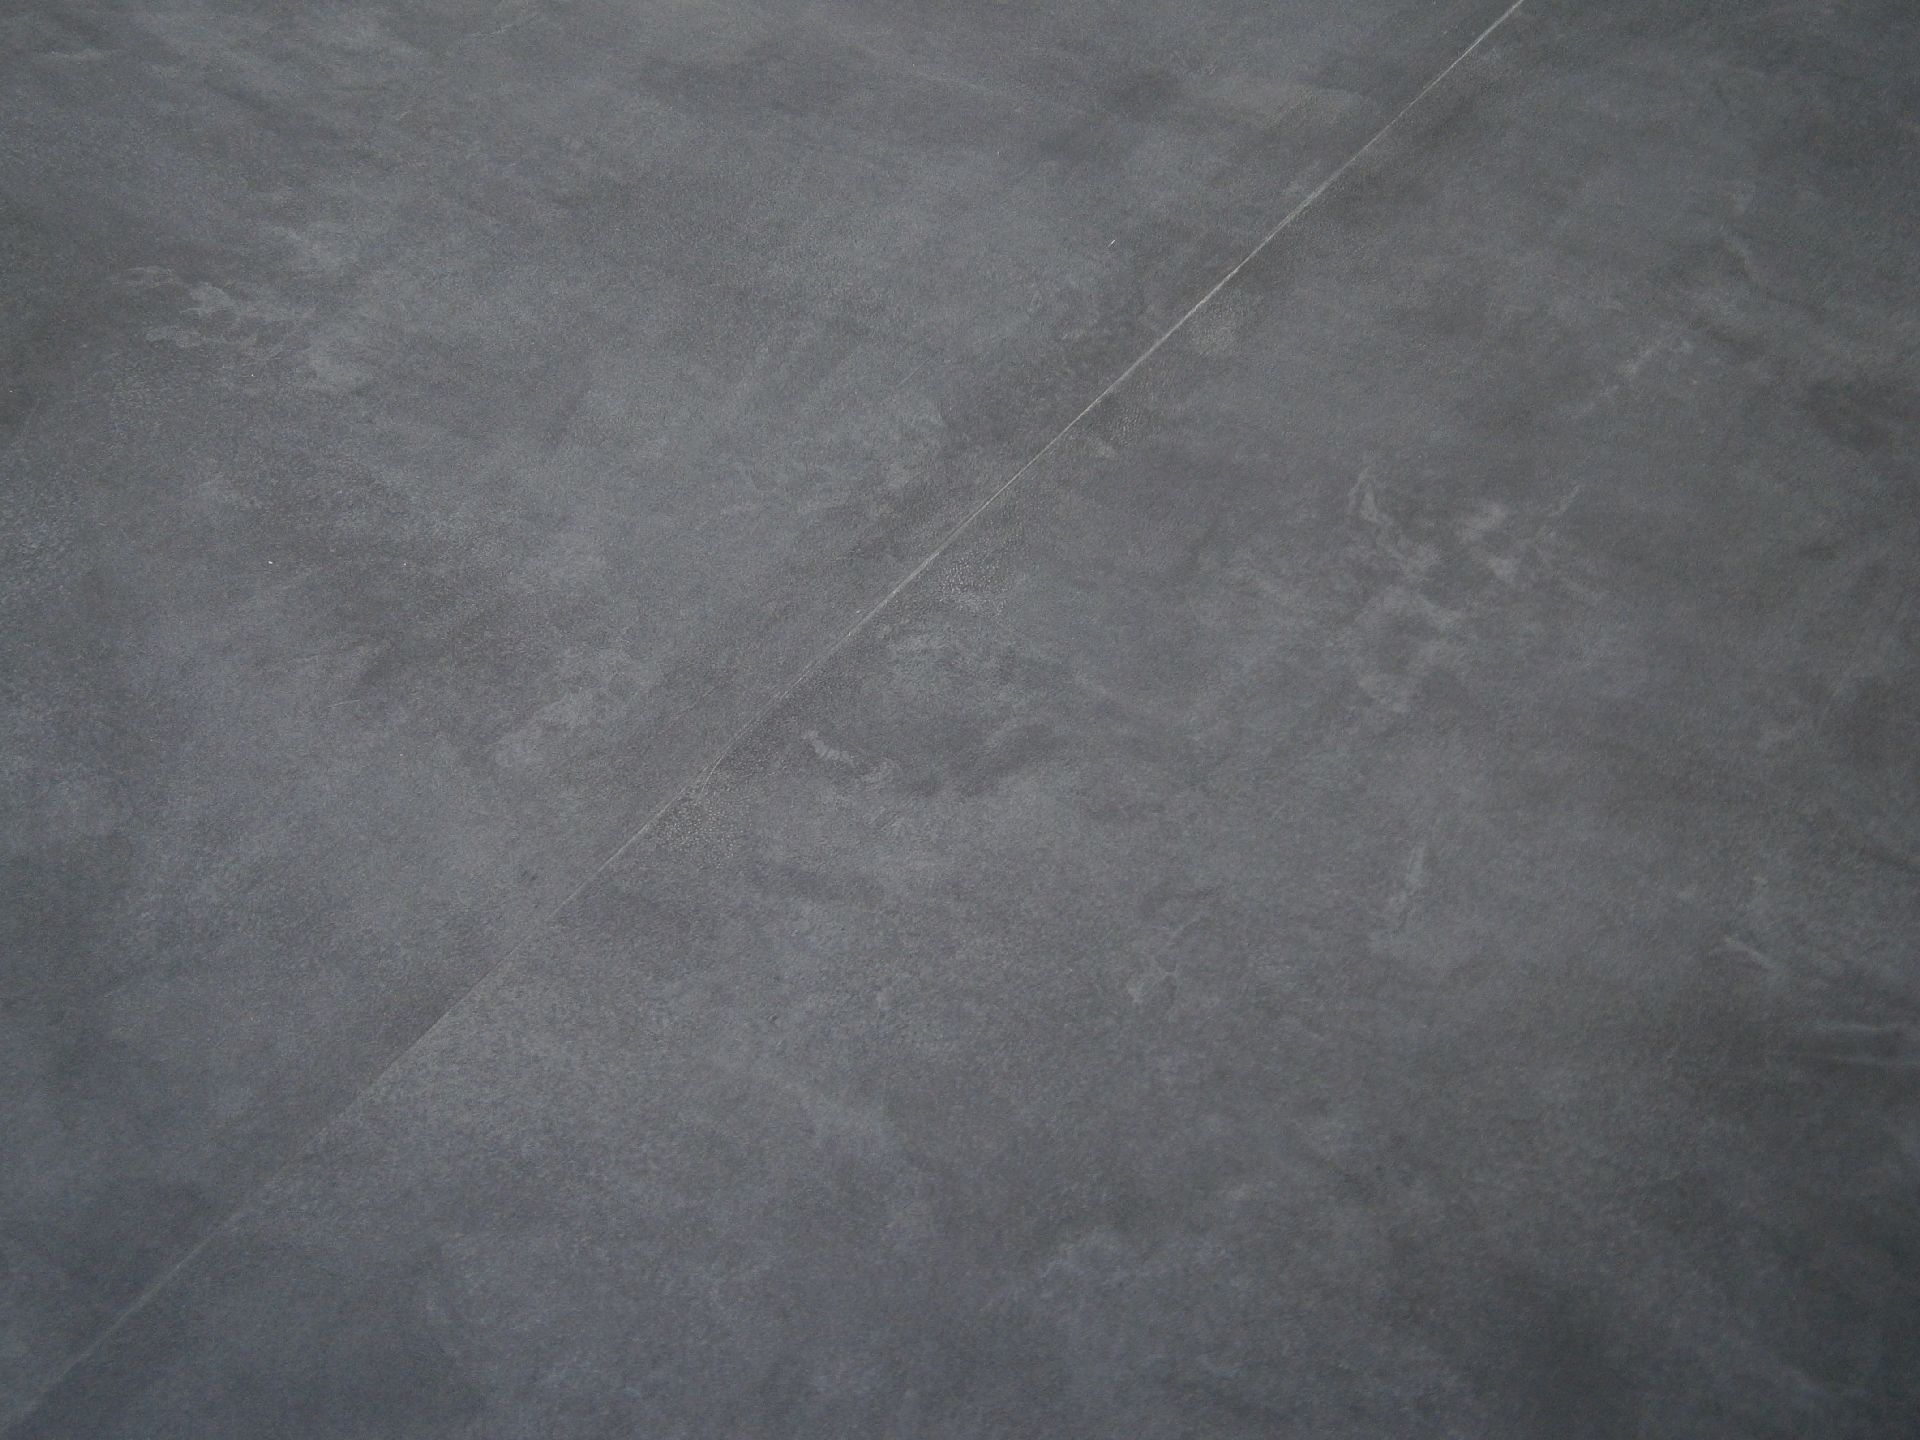 pvc boden betonoptik zur nutzung gefrbte betonoptik iq. Black Bedroom Furniture Sets. Home Design Ideas